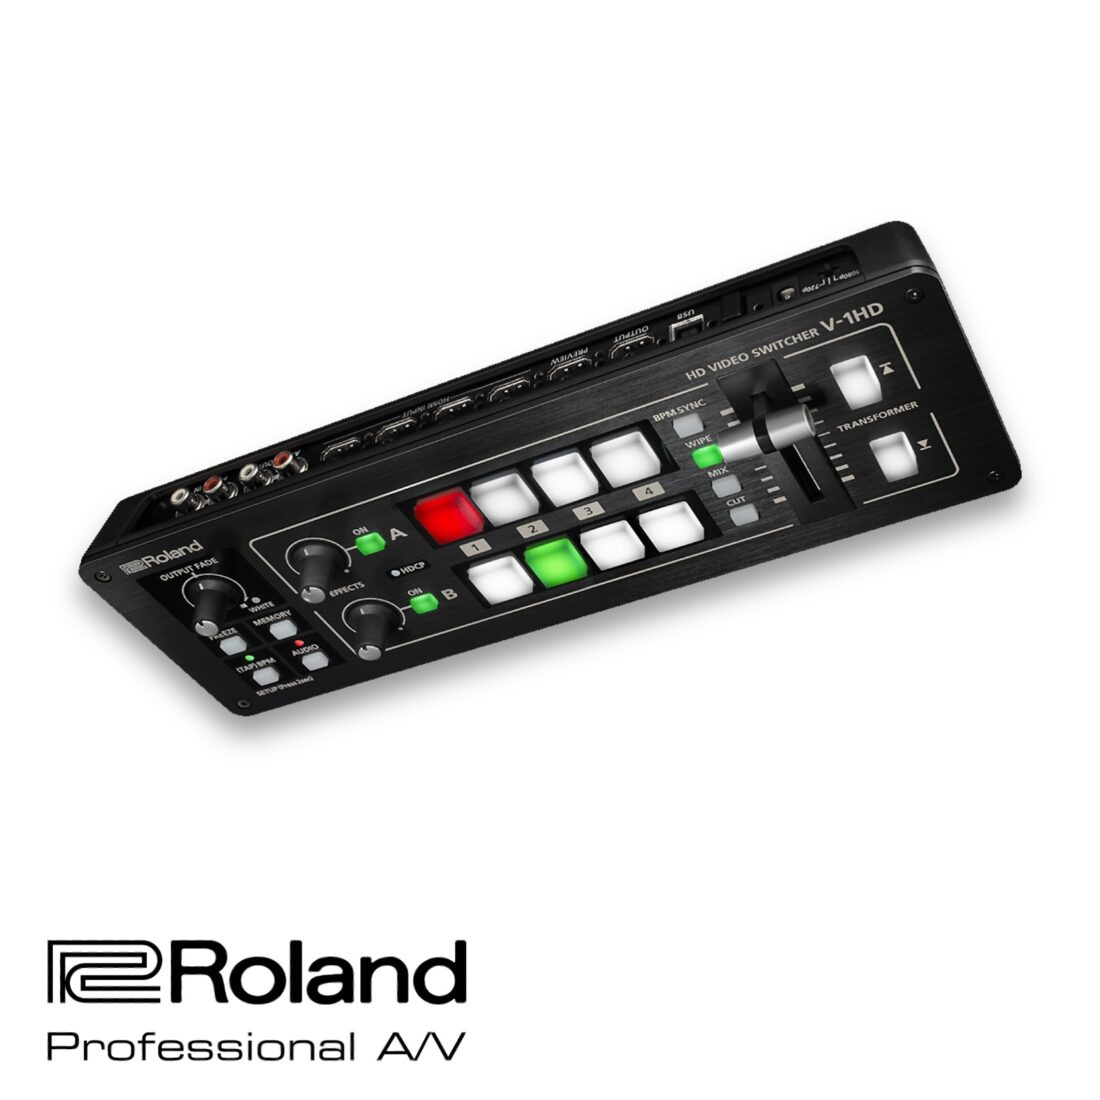 Roland V-1HD front